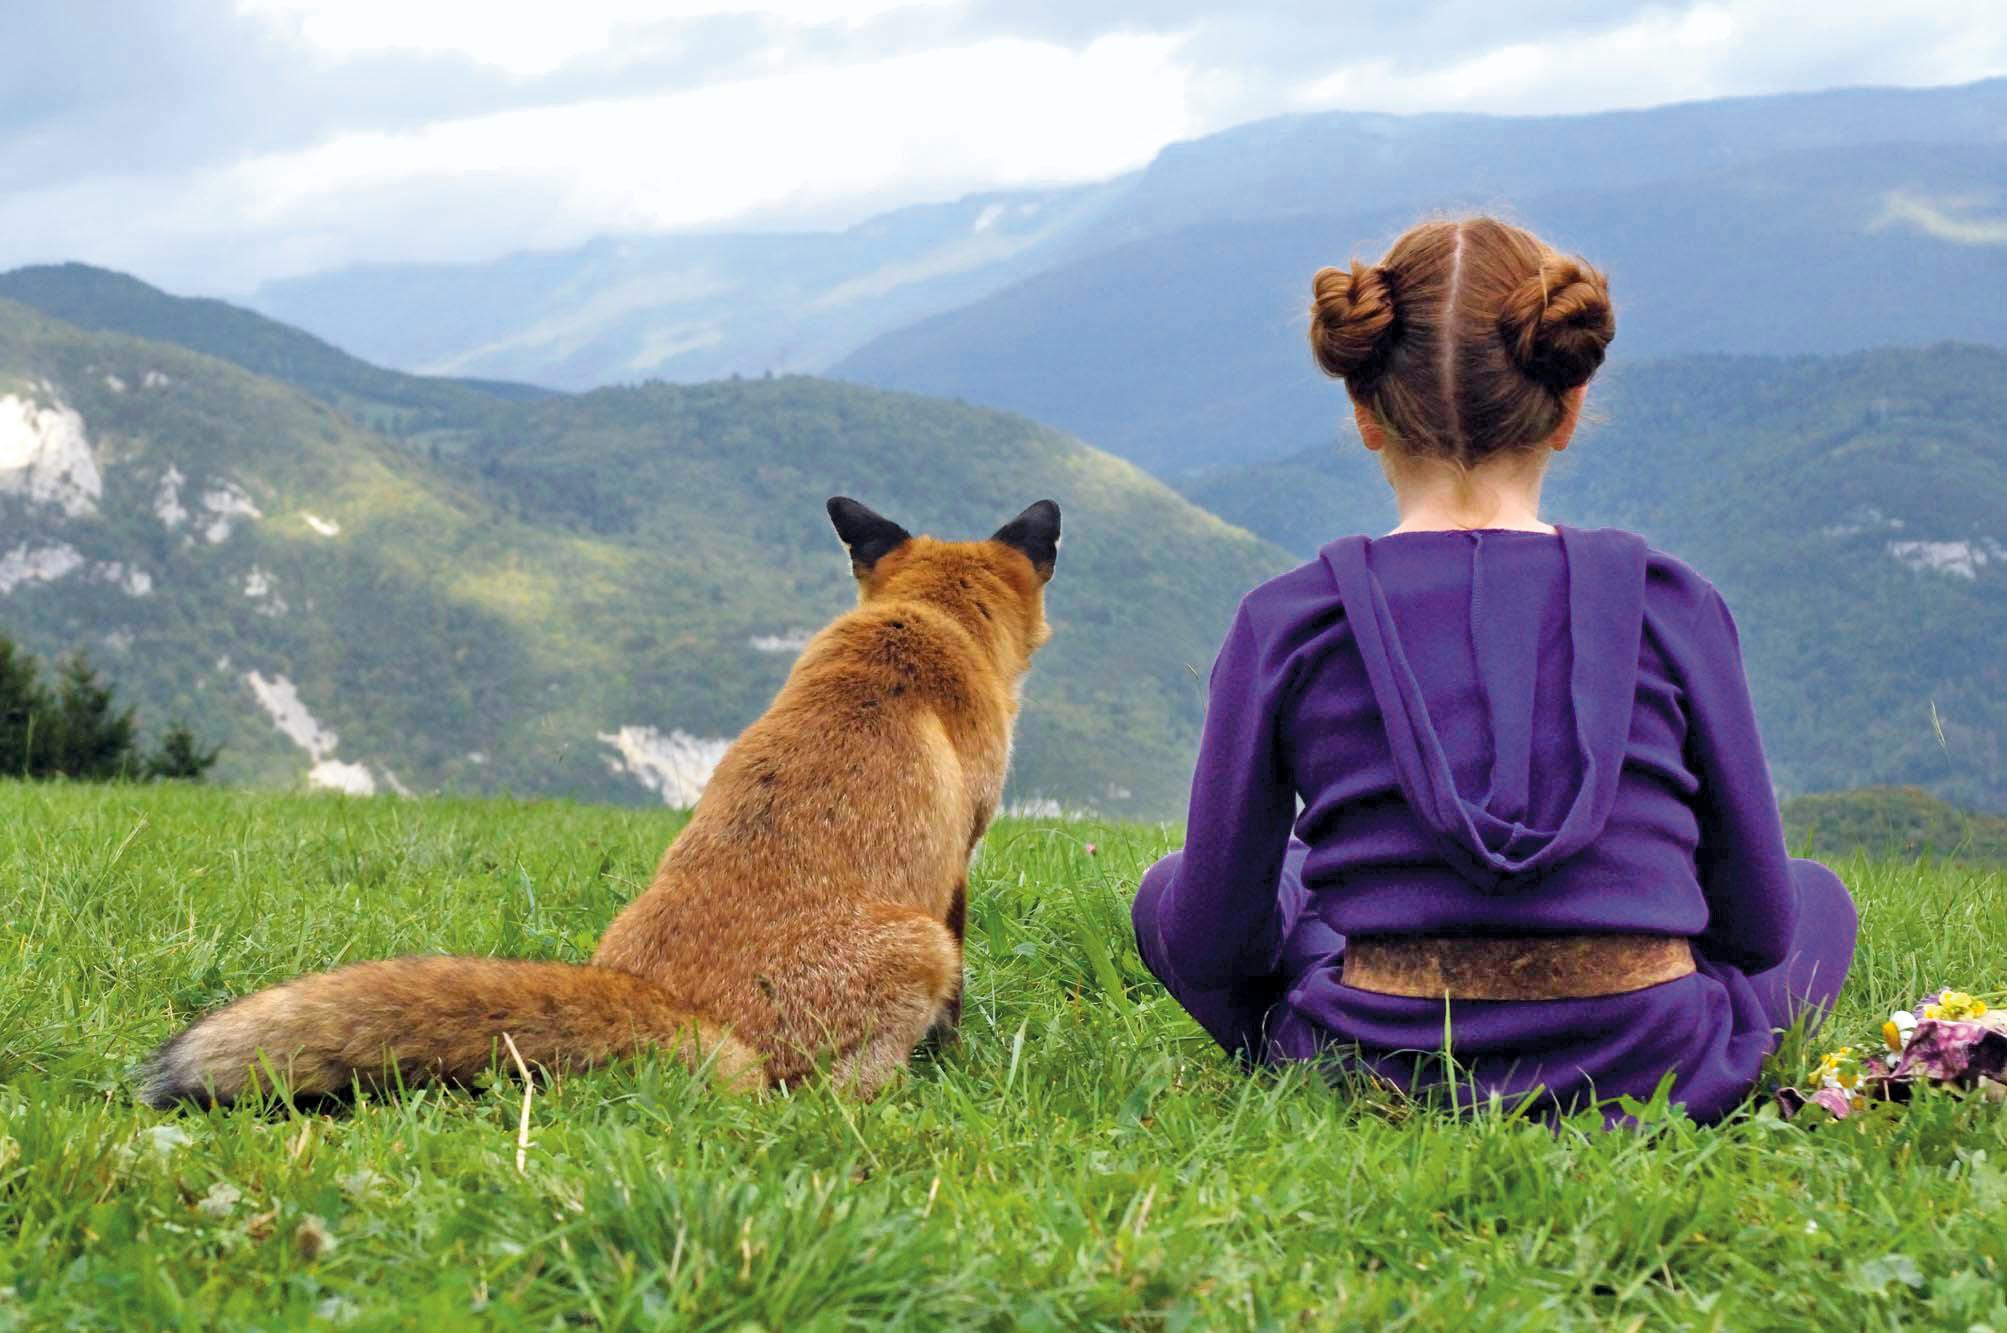 Una amistat inoblidable (Le renard et l´enfant)